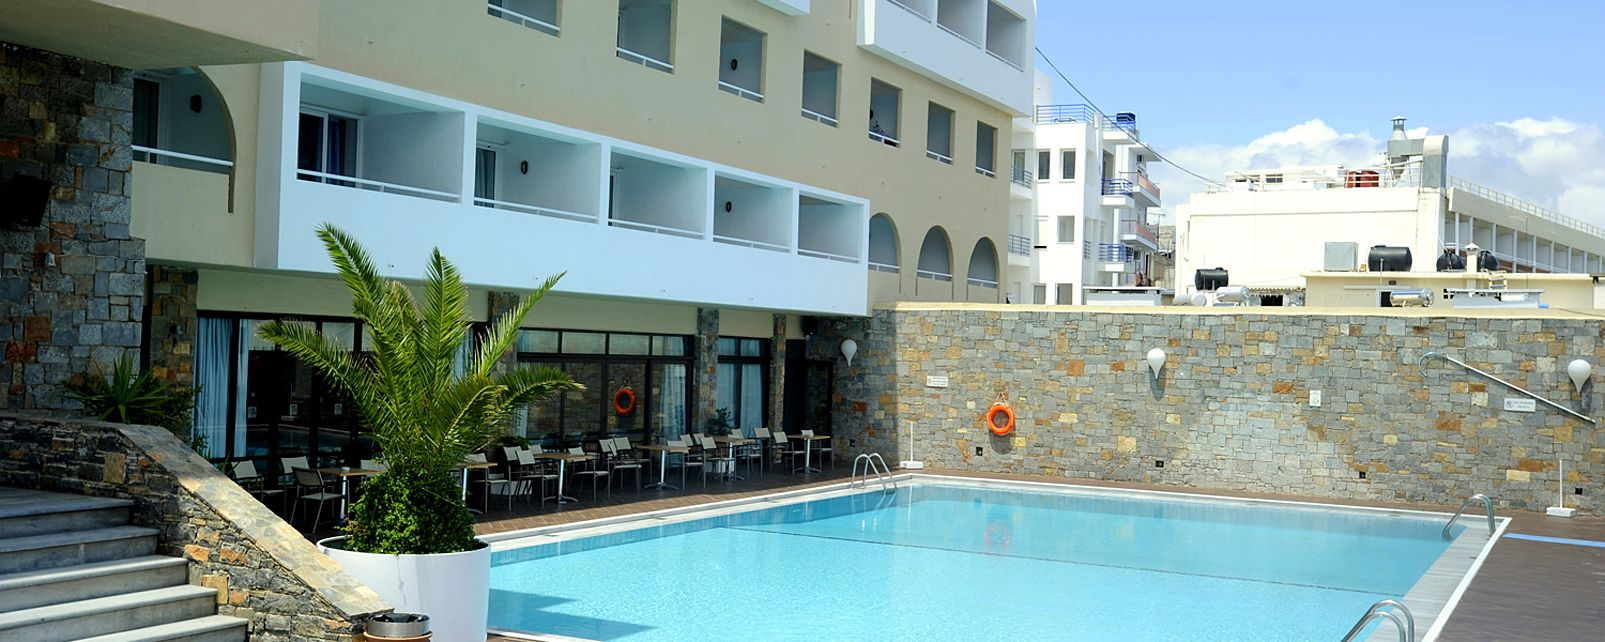 Hotel Iberostar Hermes